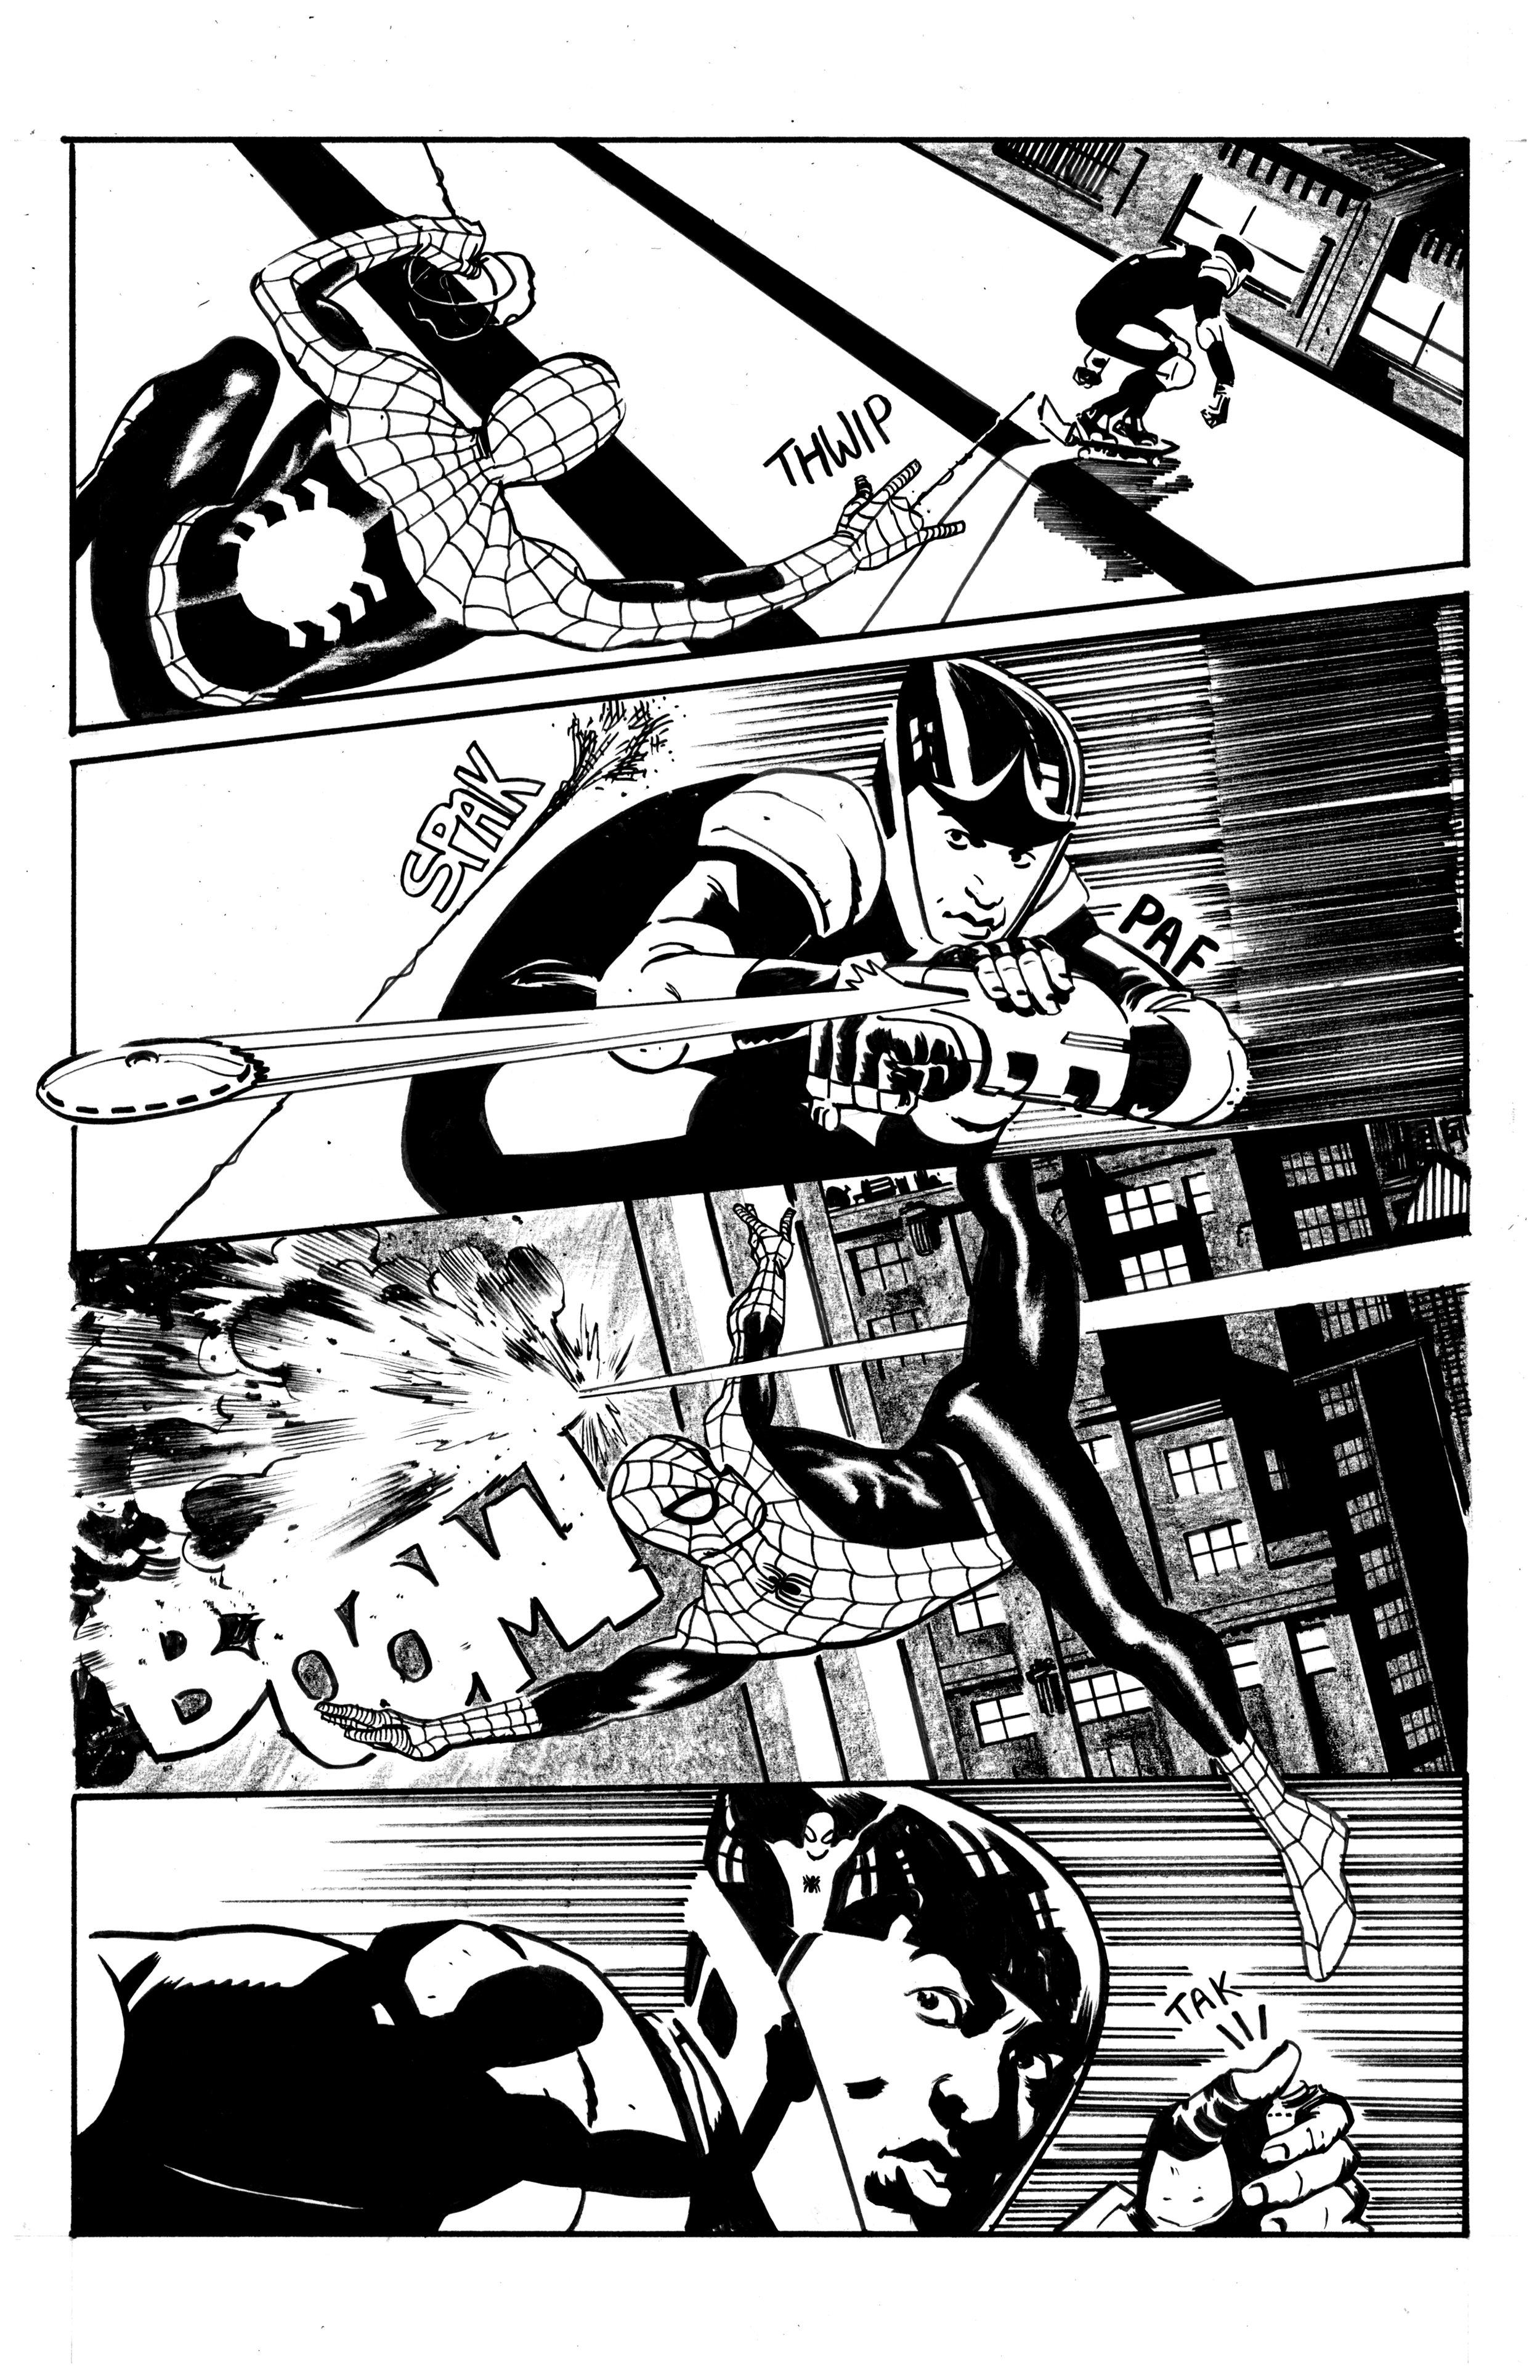 Spiderman-2-Web.jpg